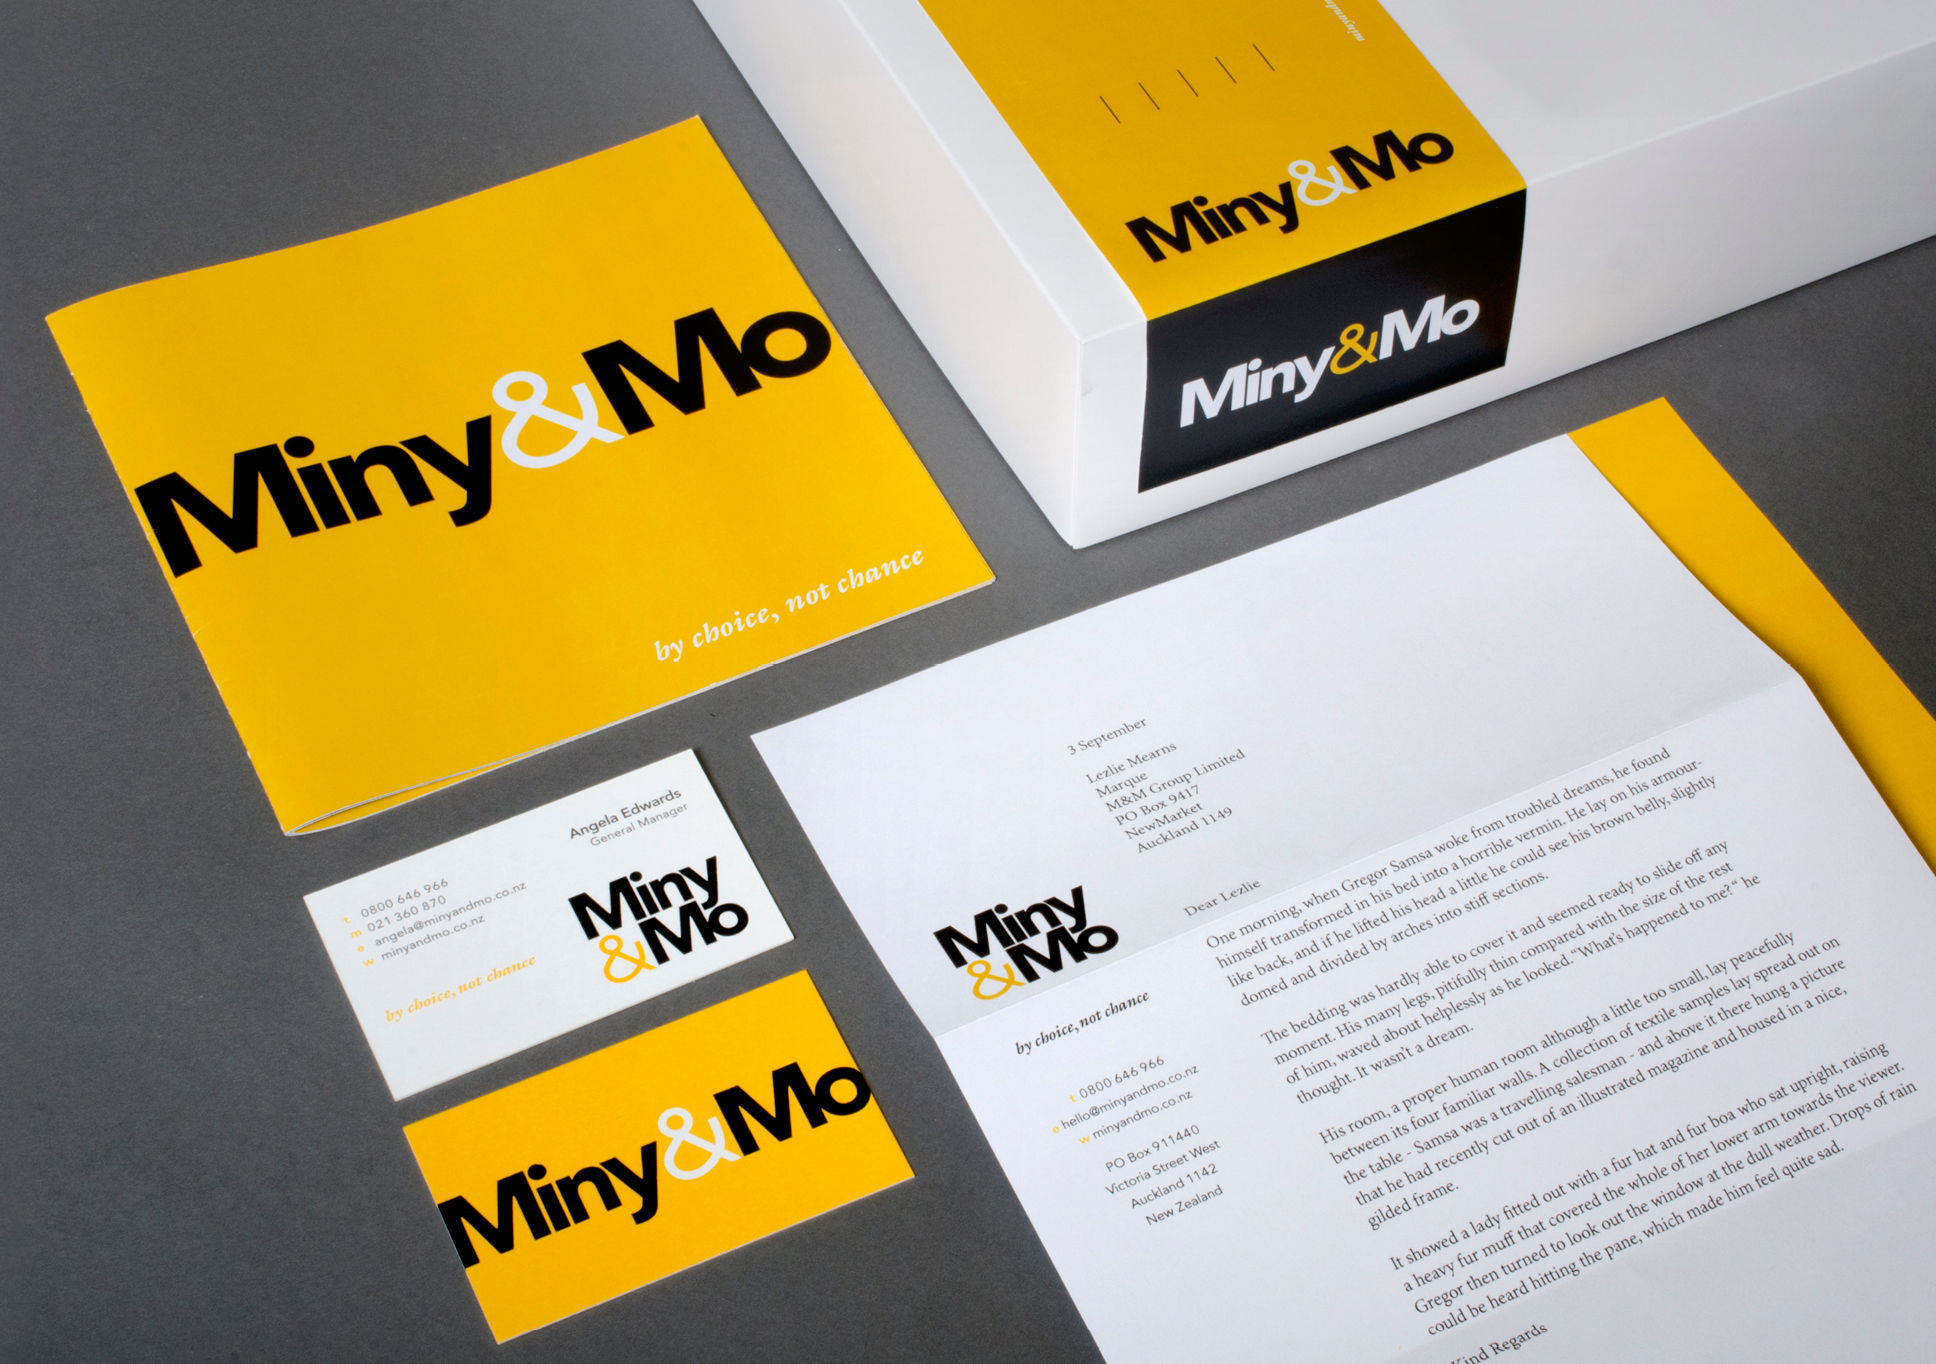 Miny&Mo print material